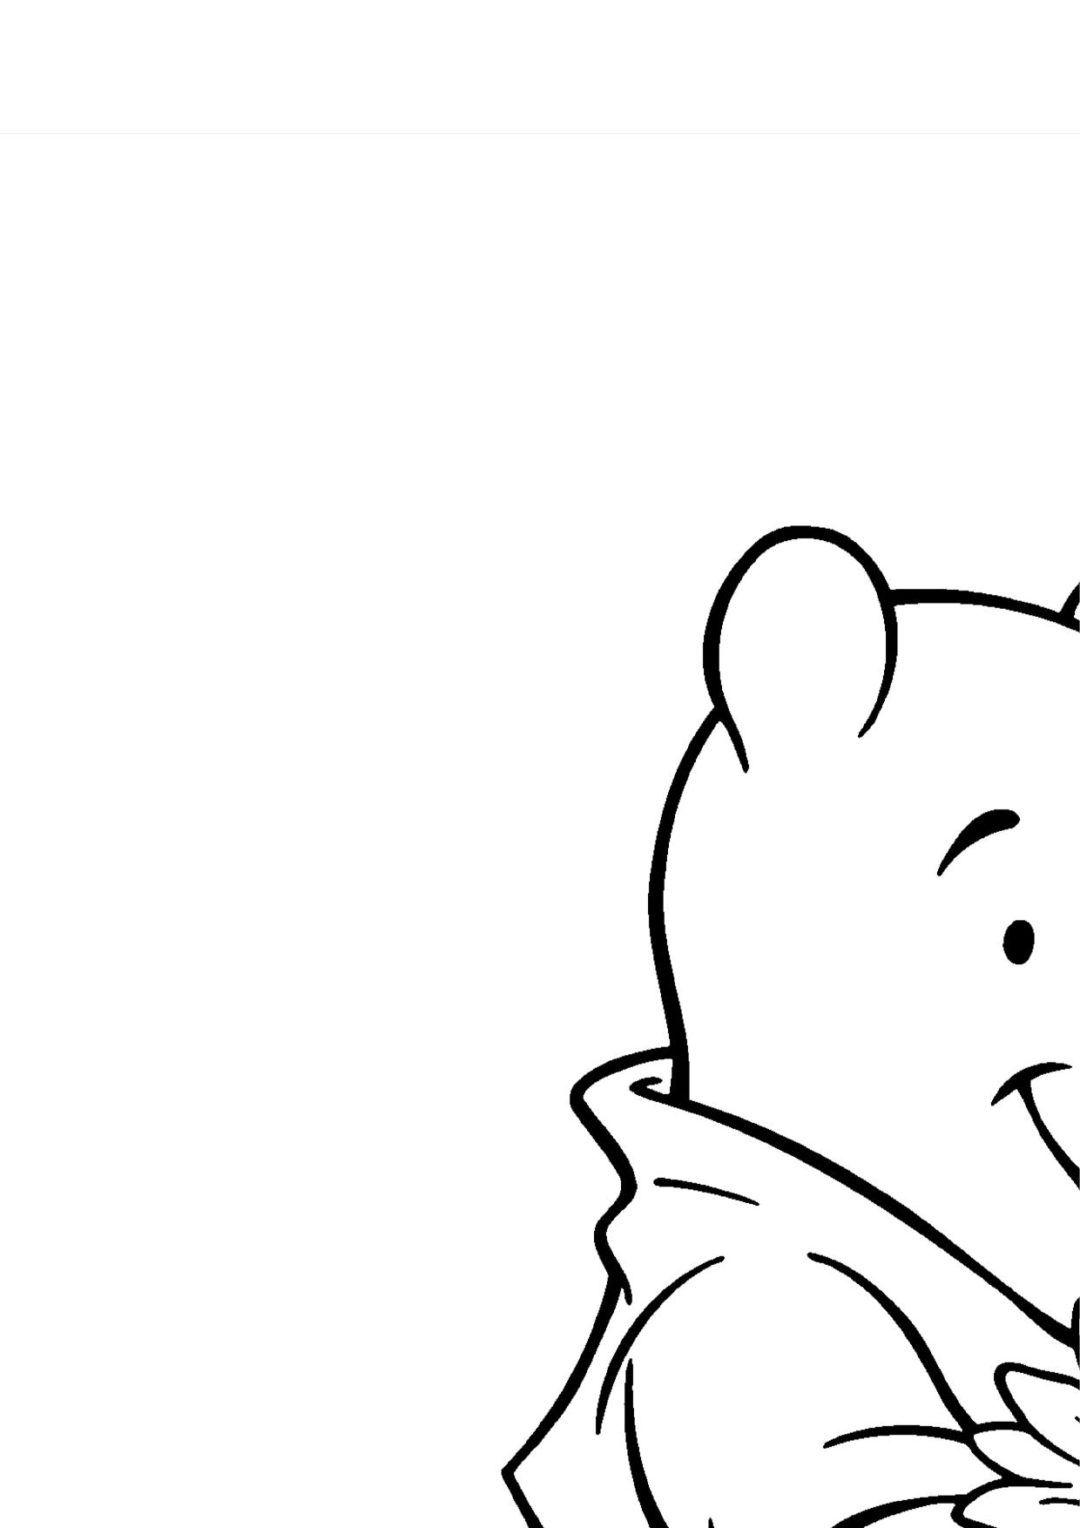 Kolorowanki Xxl Kubus Puchatek Dzien Kubusia Puchatka Kolorowanki Xxl Square Glass Snoopy Art